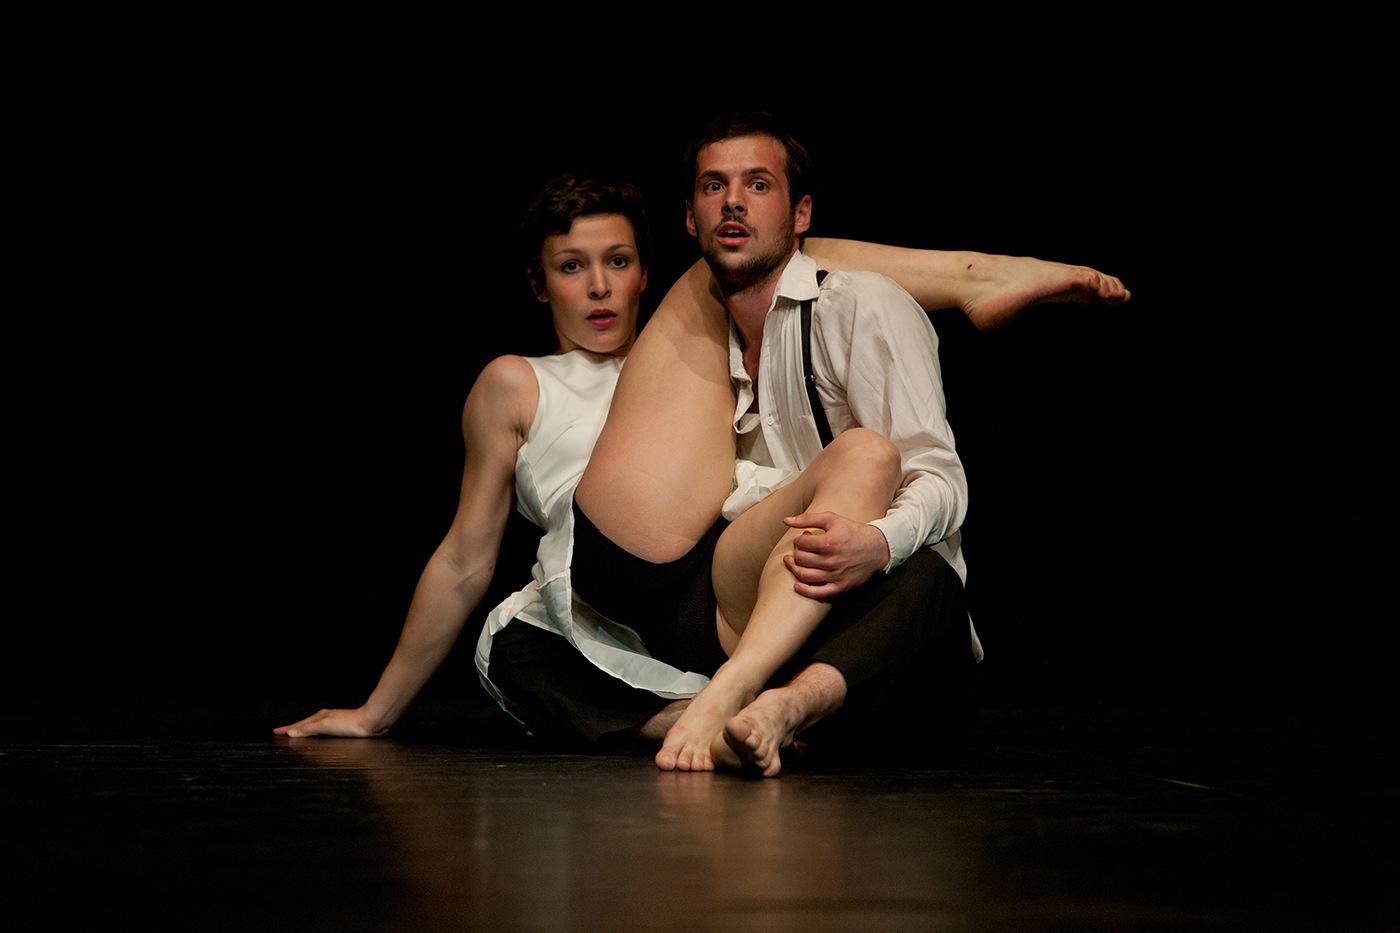 photographe-reportage-danse-avec-ton-crous-guillaume-heraud-008-small